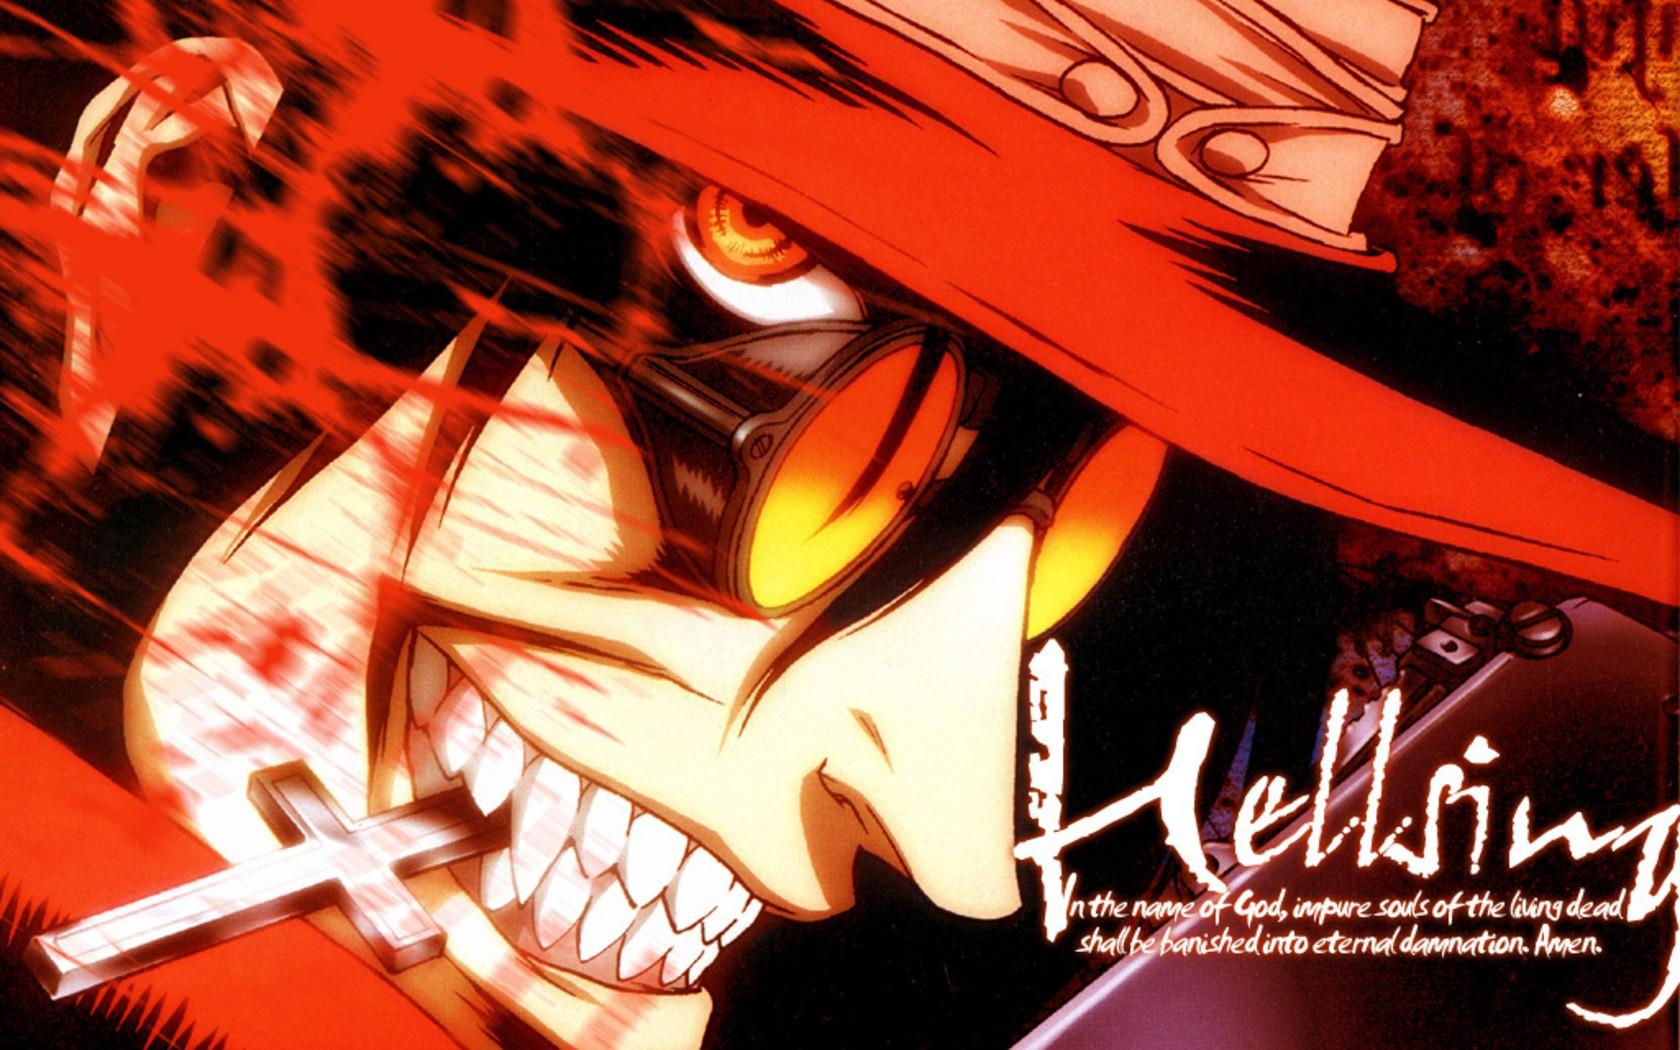 Hellsing,alucard,smile,eyes